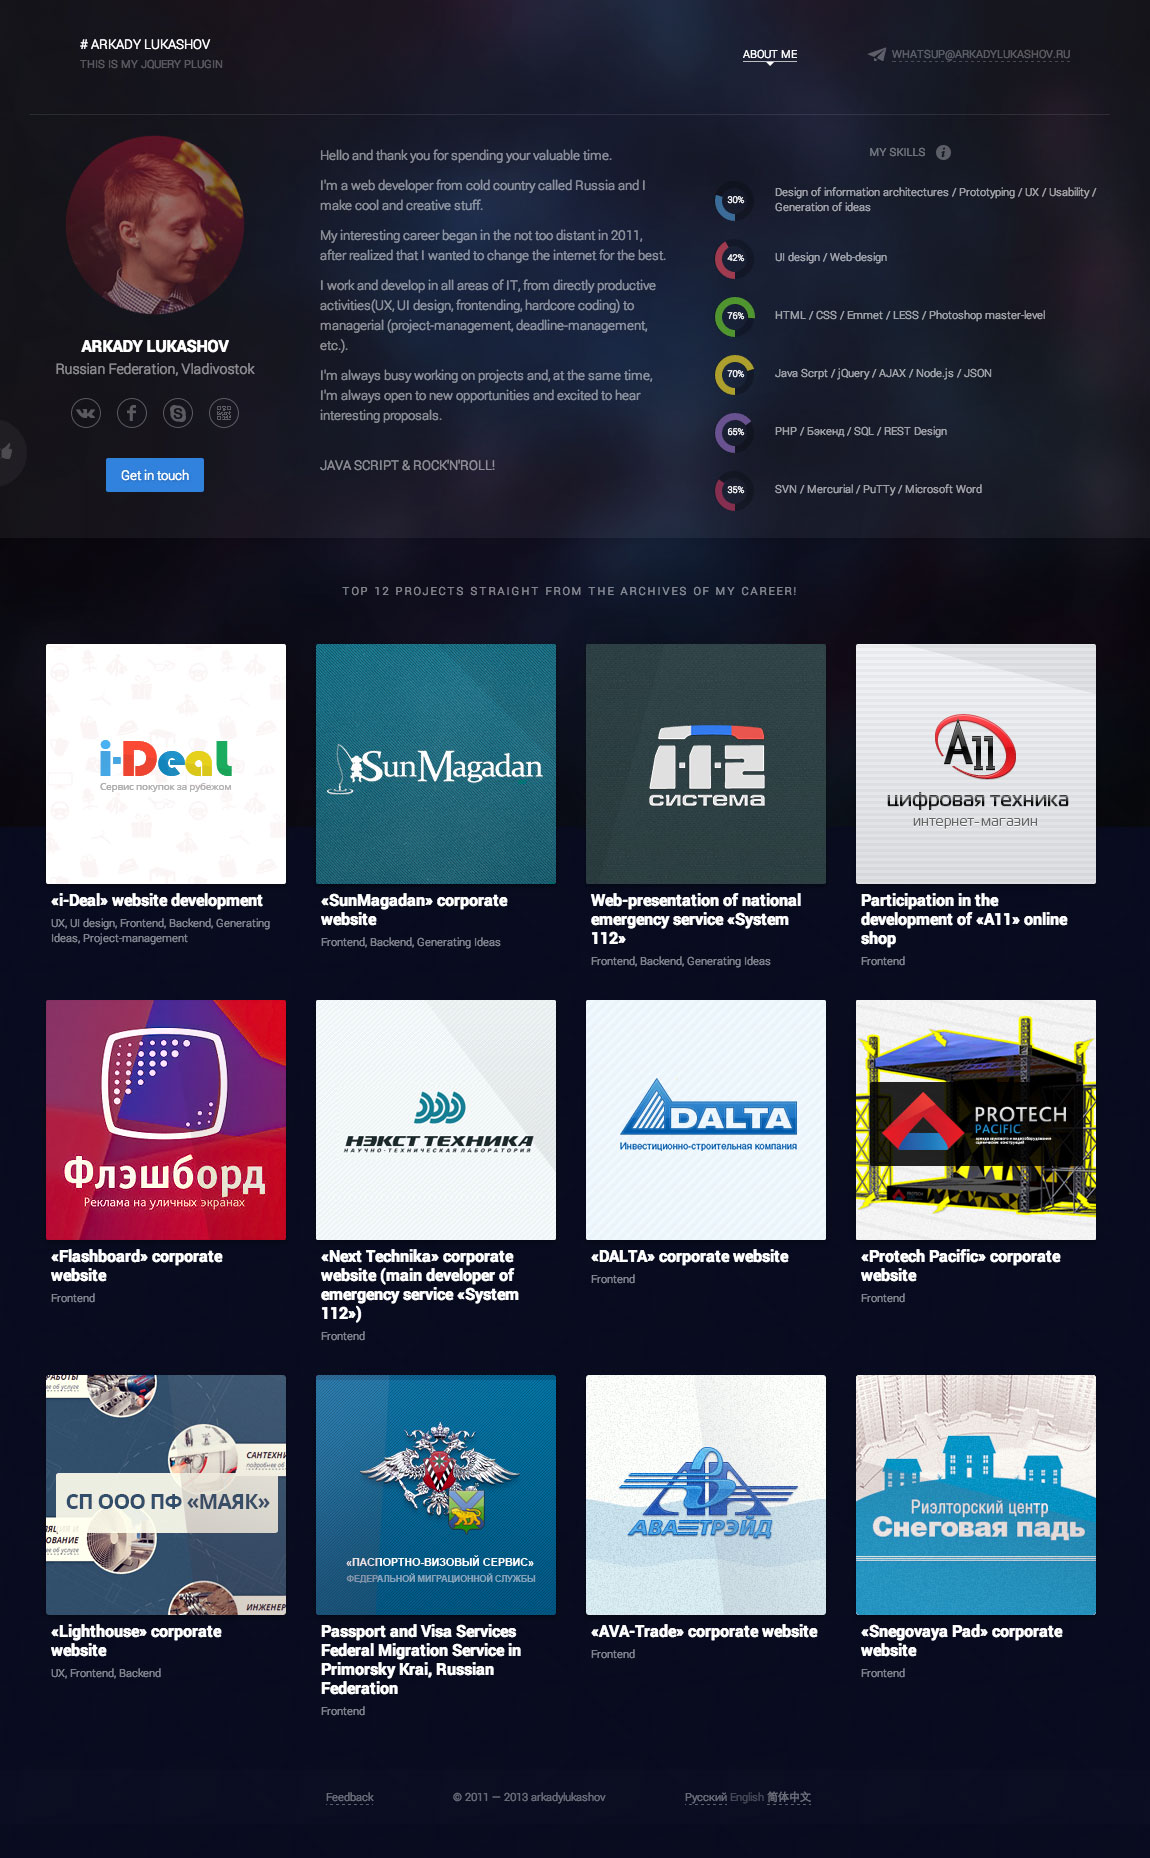 Arkady Lukashov Website Screenshot